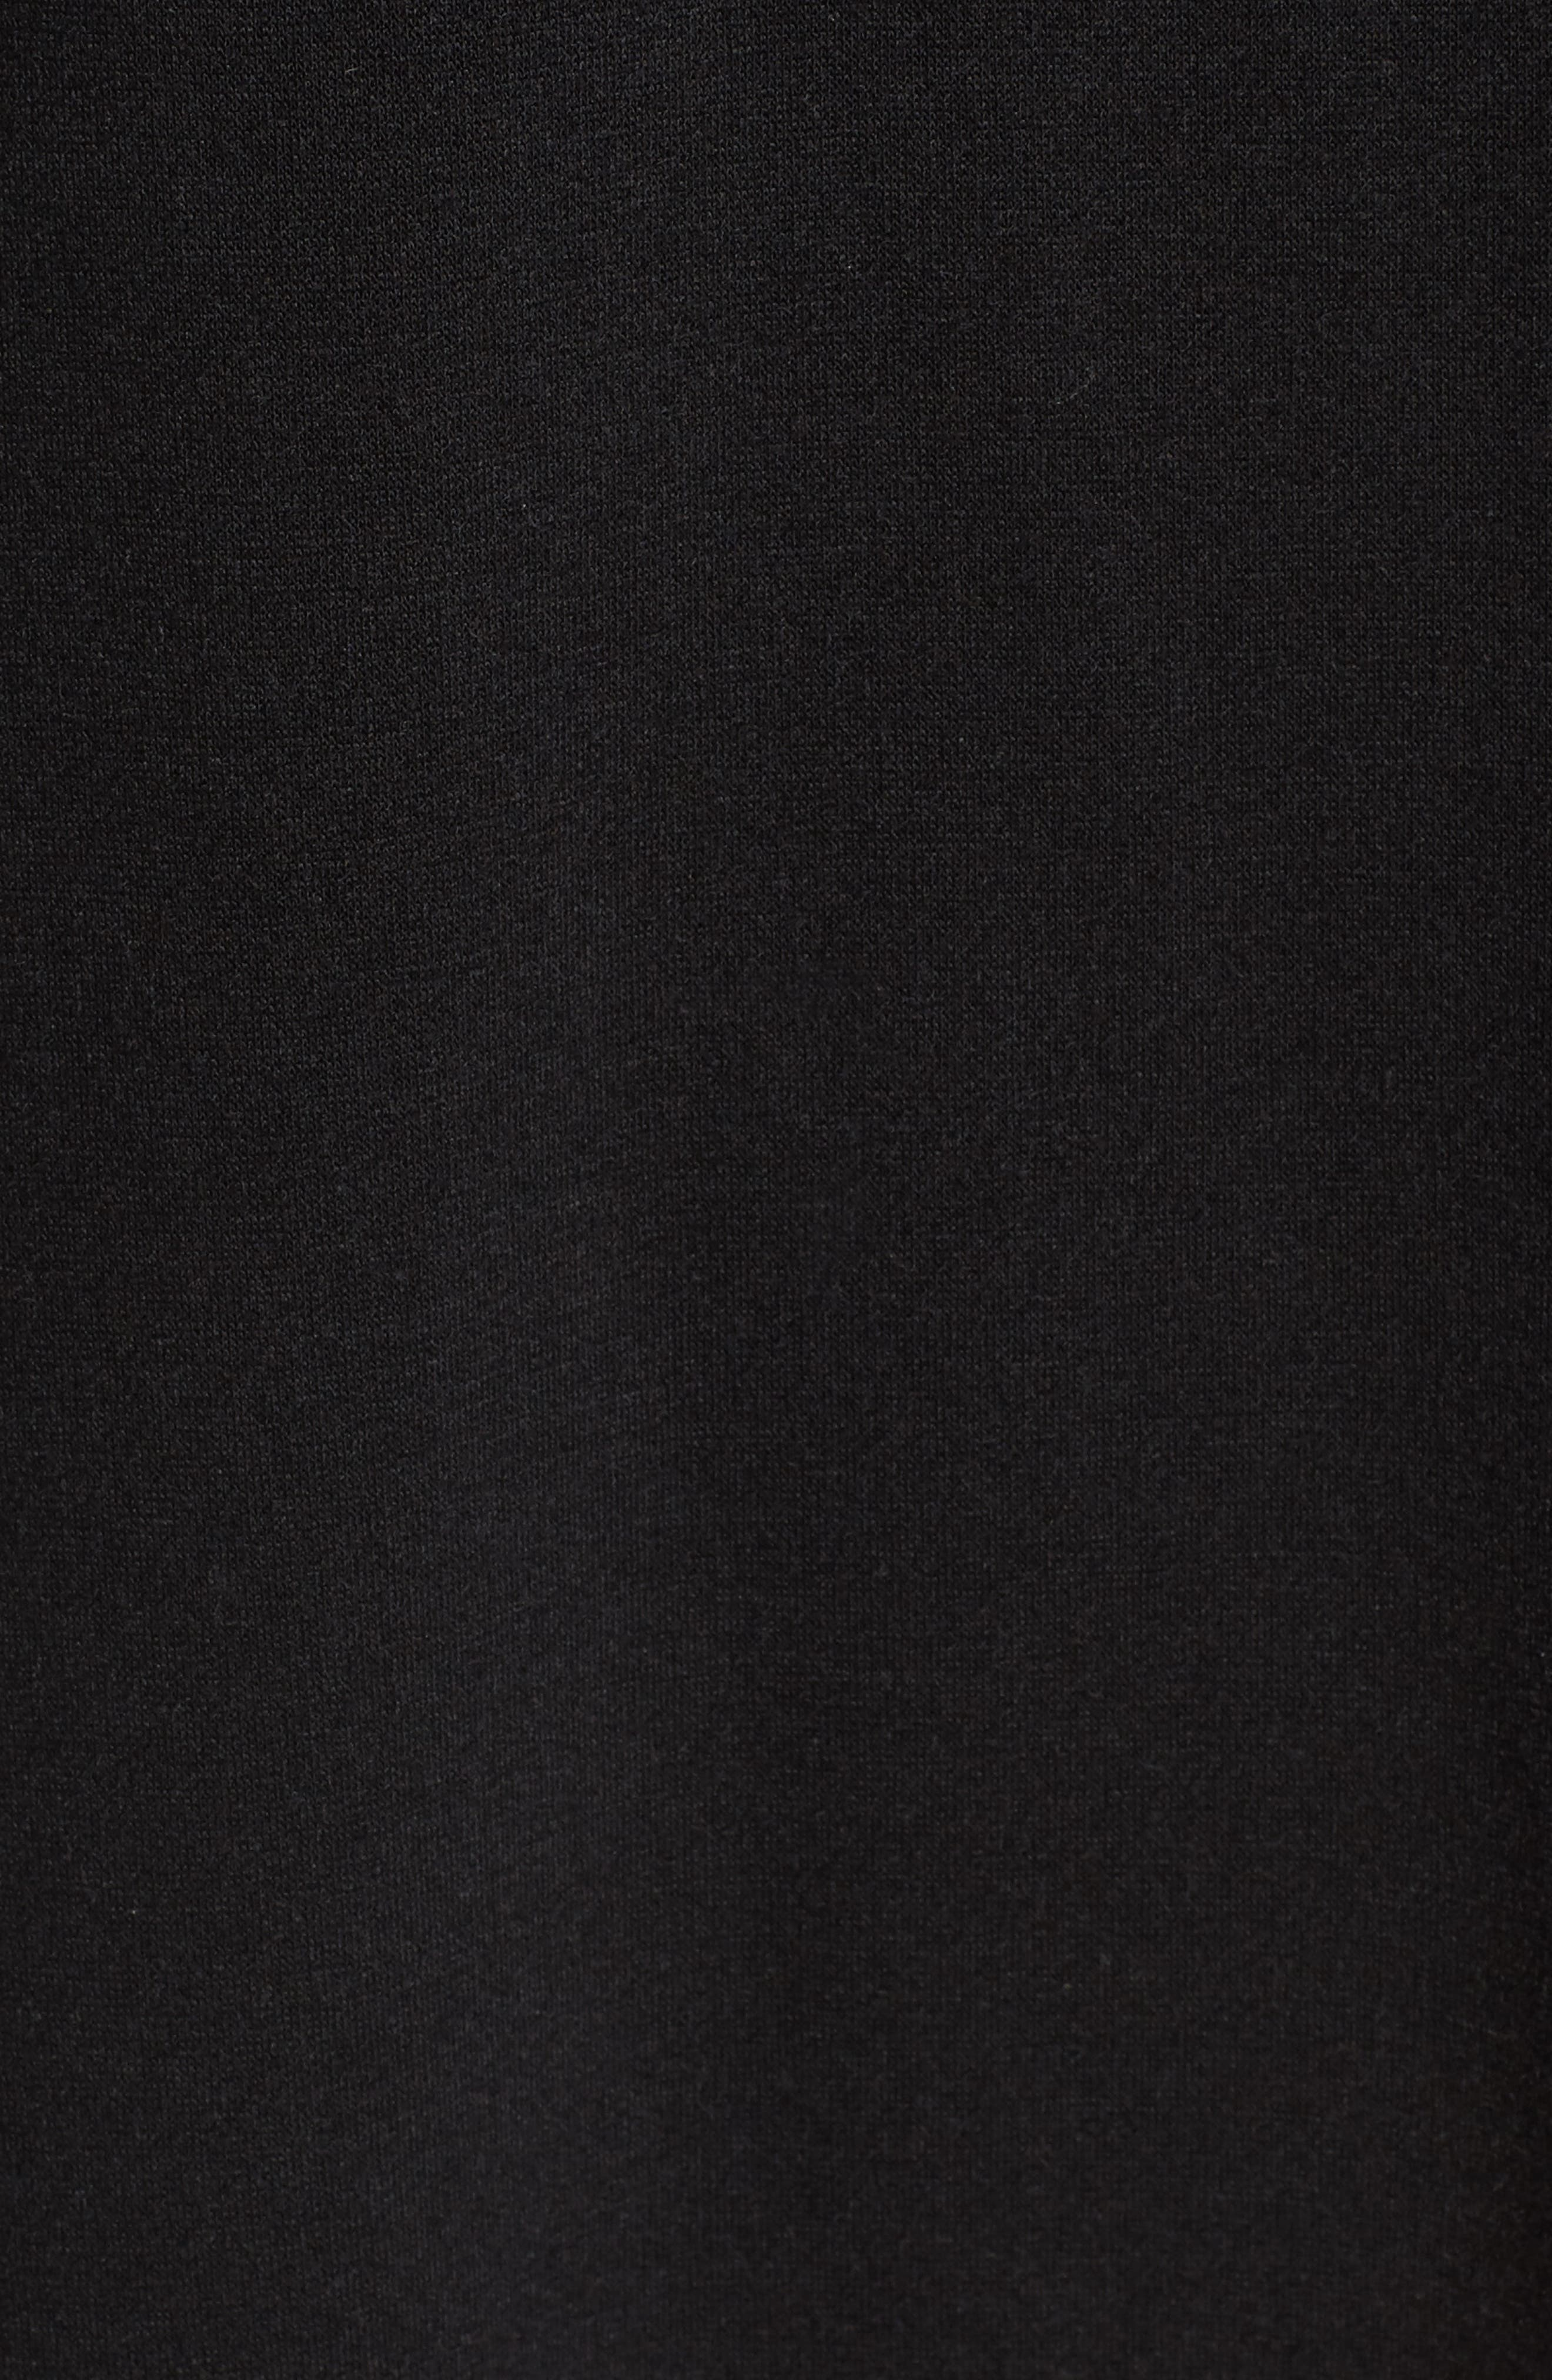 Tulle Ruffle Sweatshirt Dress,                             Alternate thumbnail 5, color,                             001